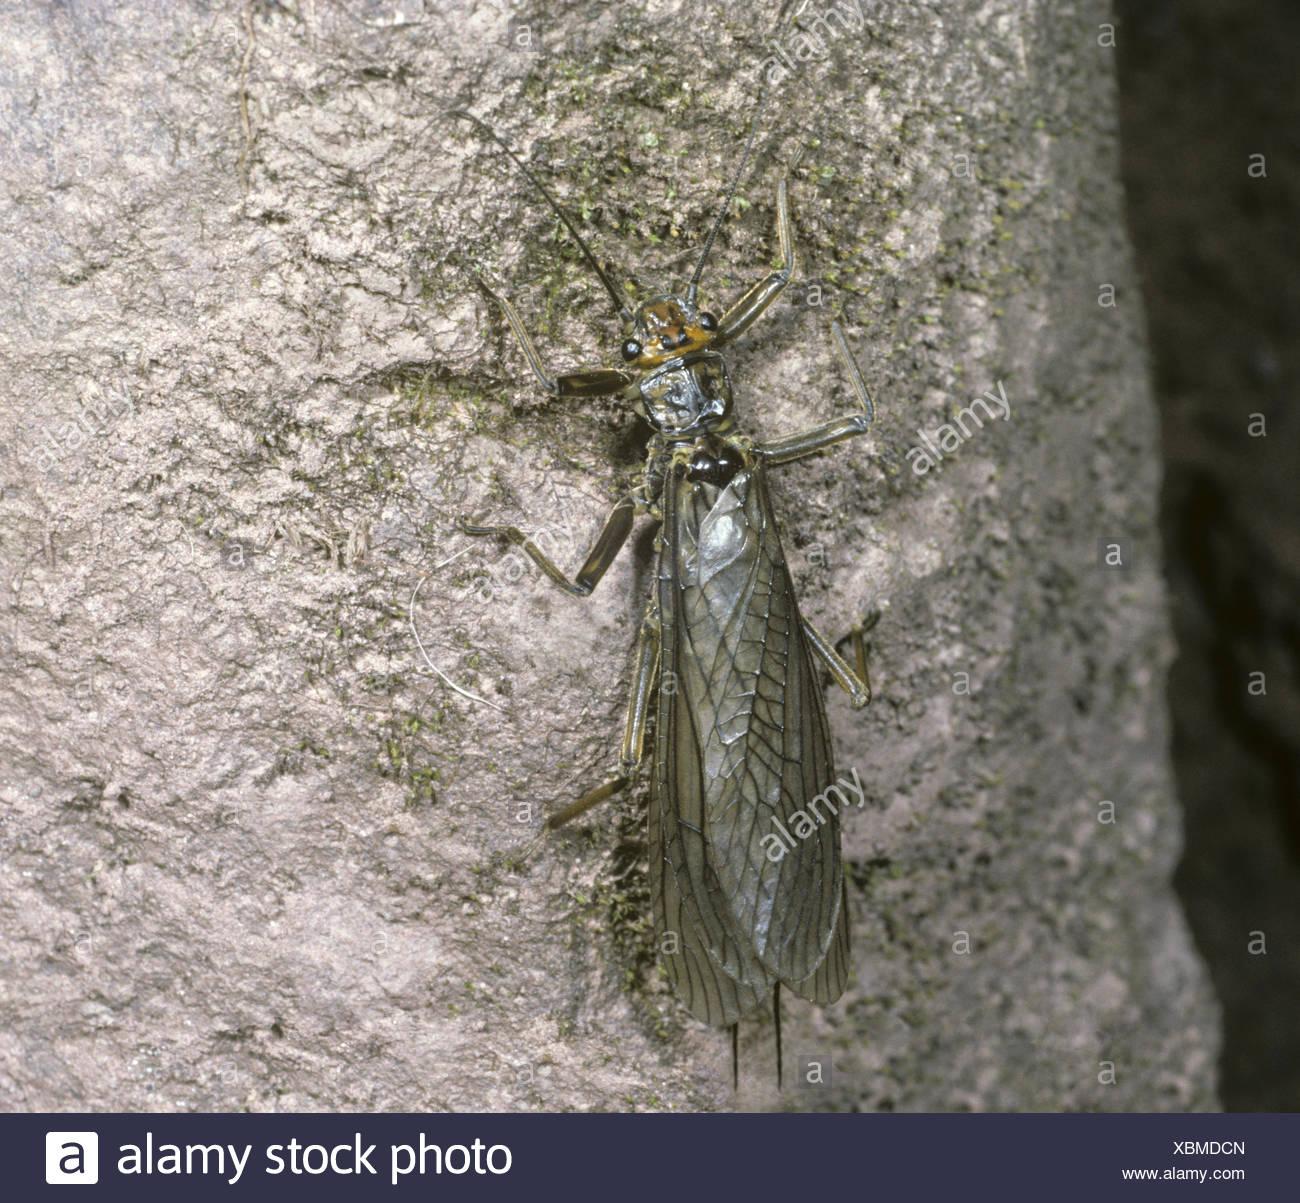 Stonefly - Dinocras cephalotes - Stock Image